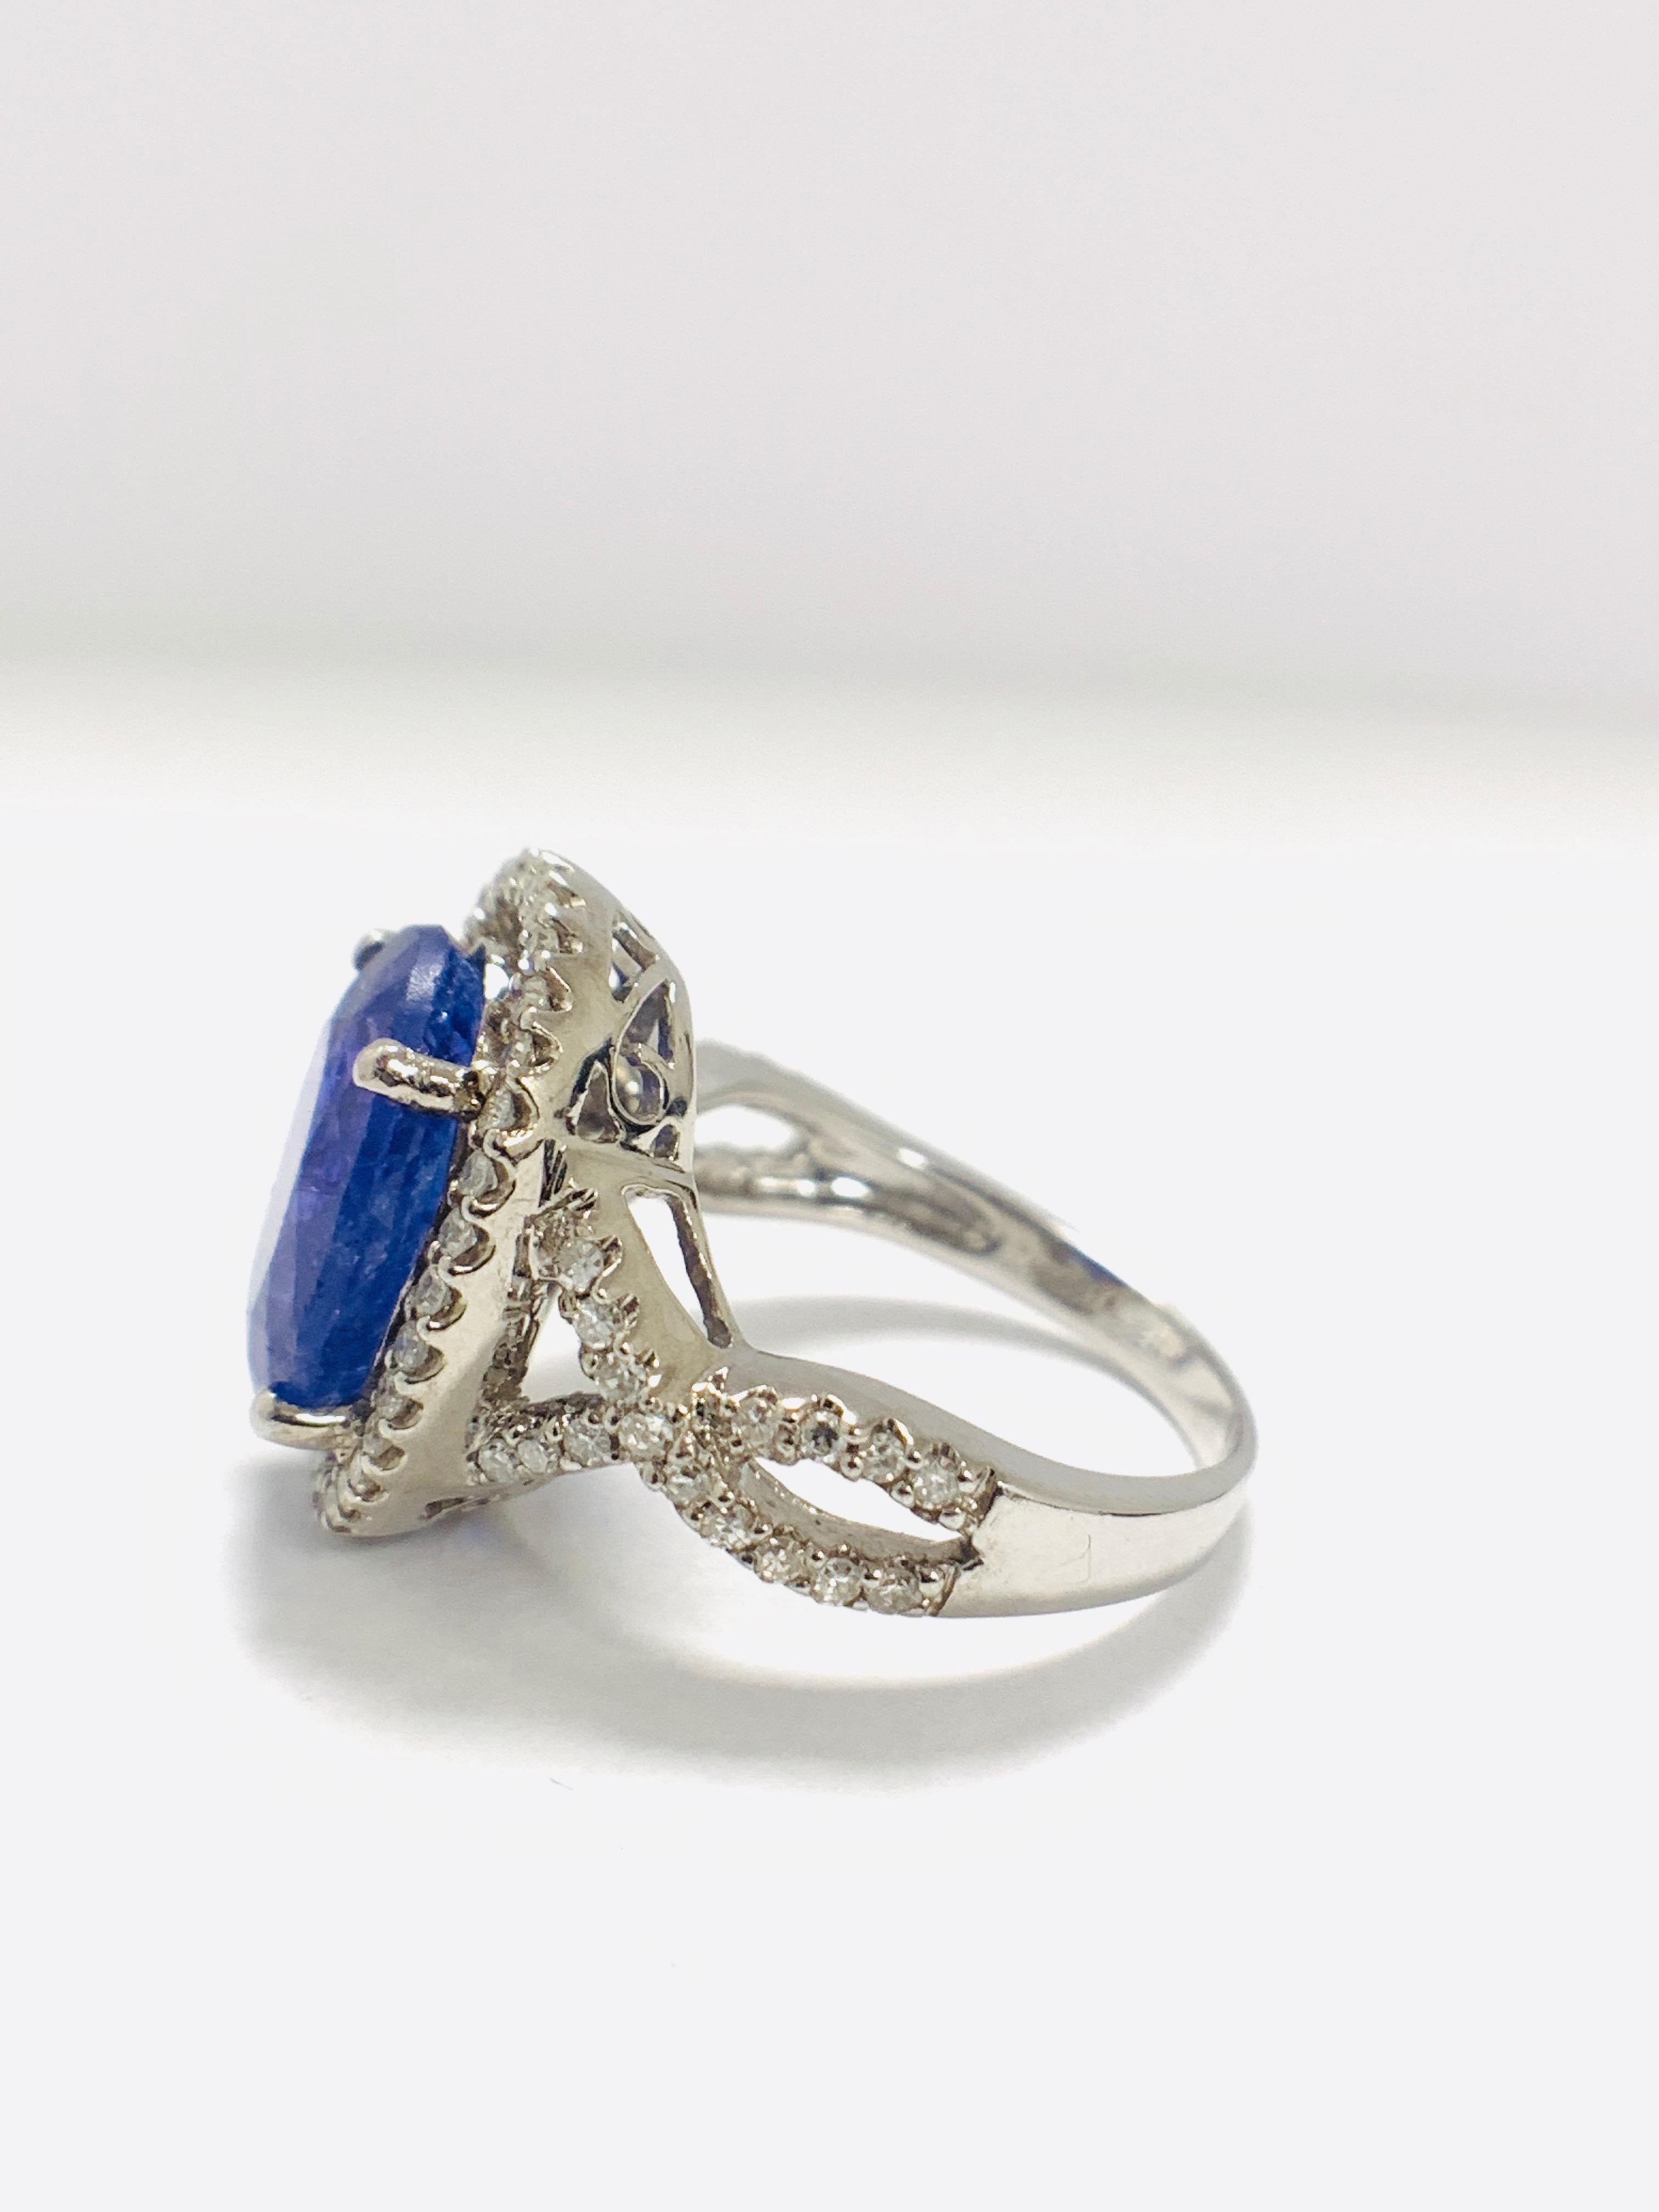 Lot 46 - 18ct White Gold Tanzanite and Diamond Ring